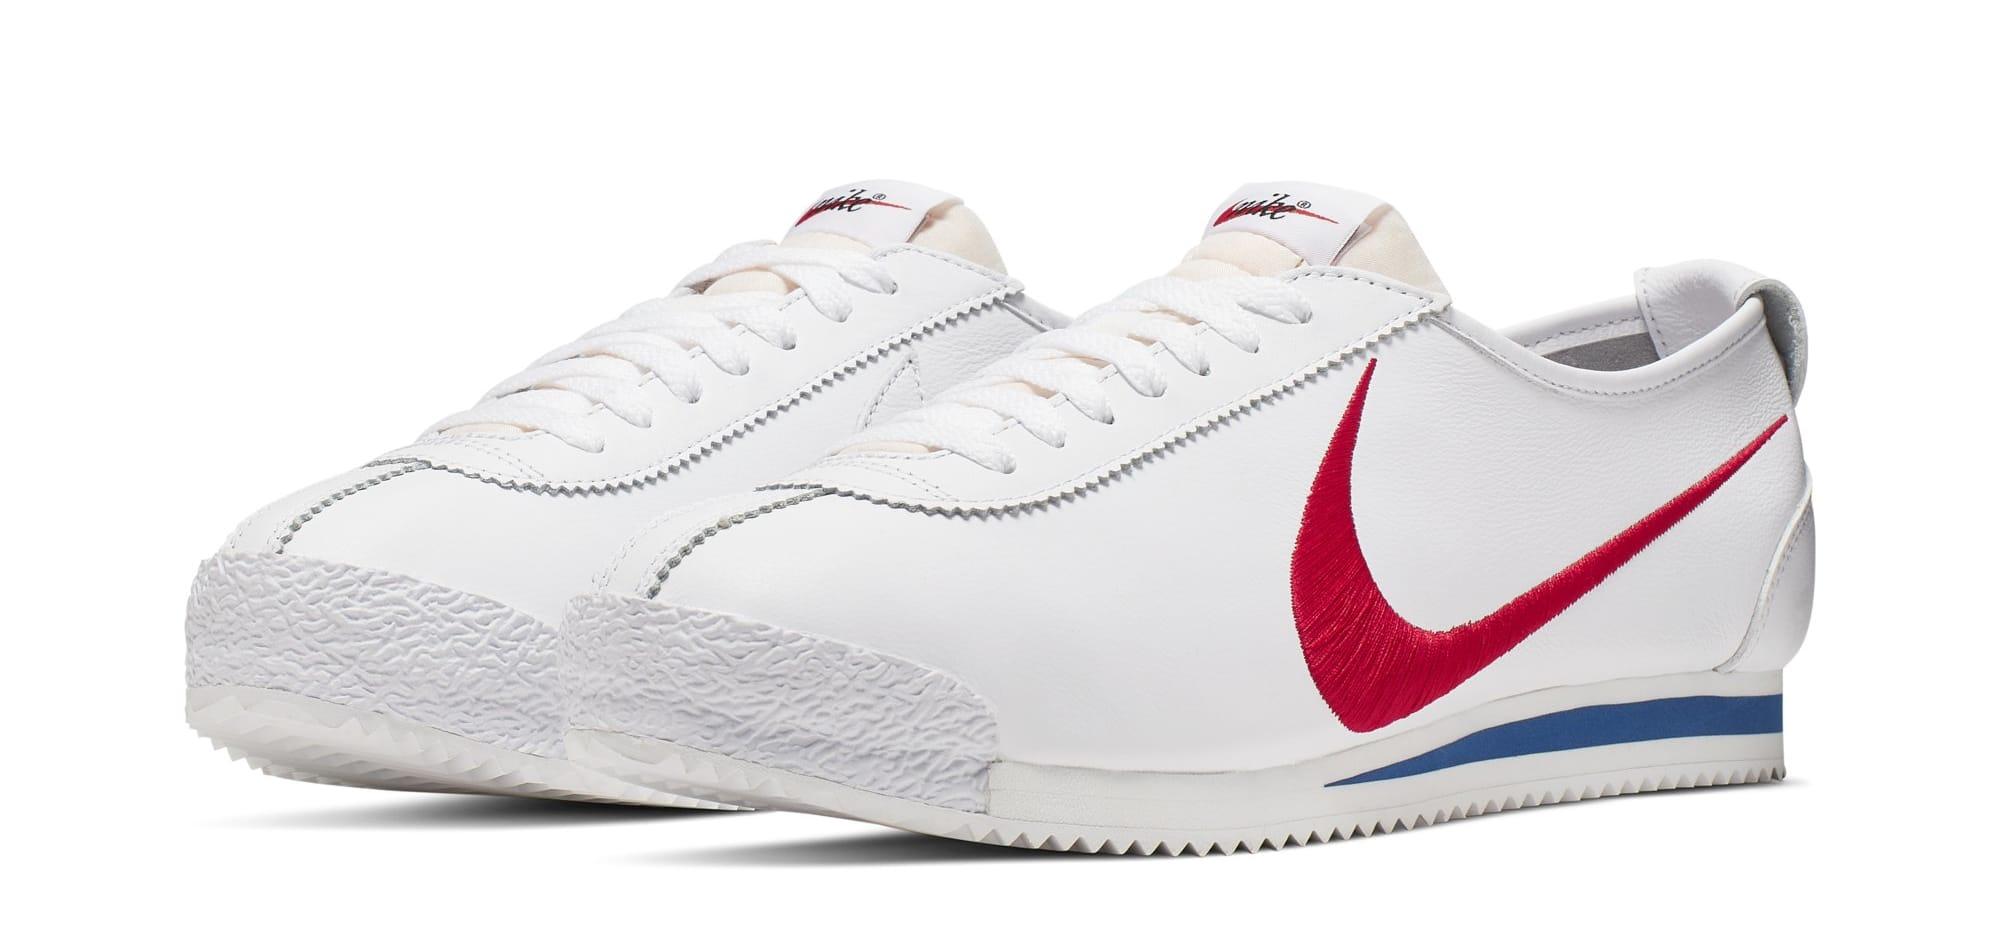 Nike Classic Cortez 'Shoe Dog Pack (Swoosh)' CJ2586-100 (Pair)